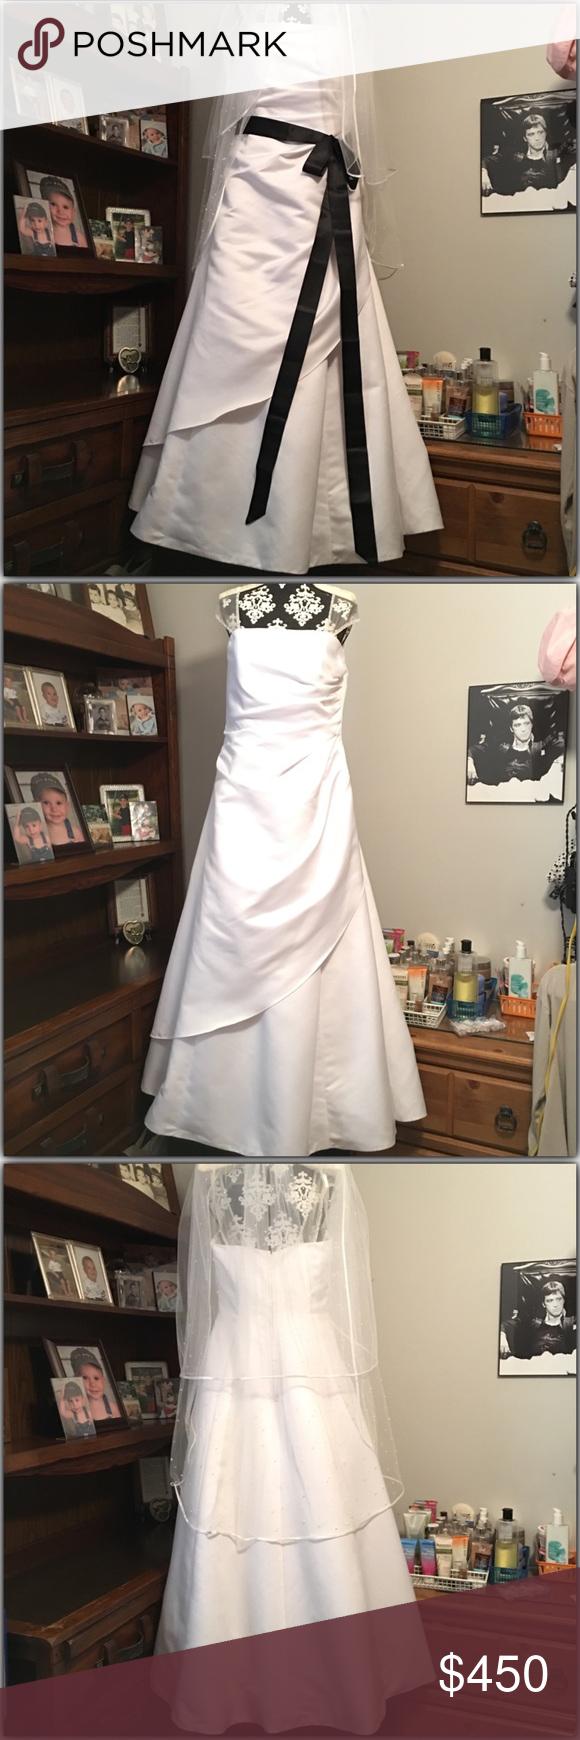 Michaelangelo wedding dress  Michaelangelo Wedding Dress  My Posh Closet  Pinterest